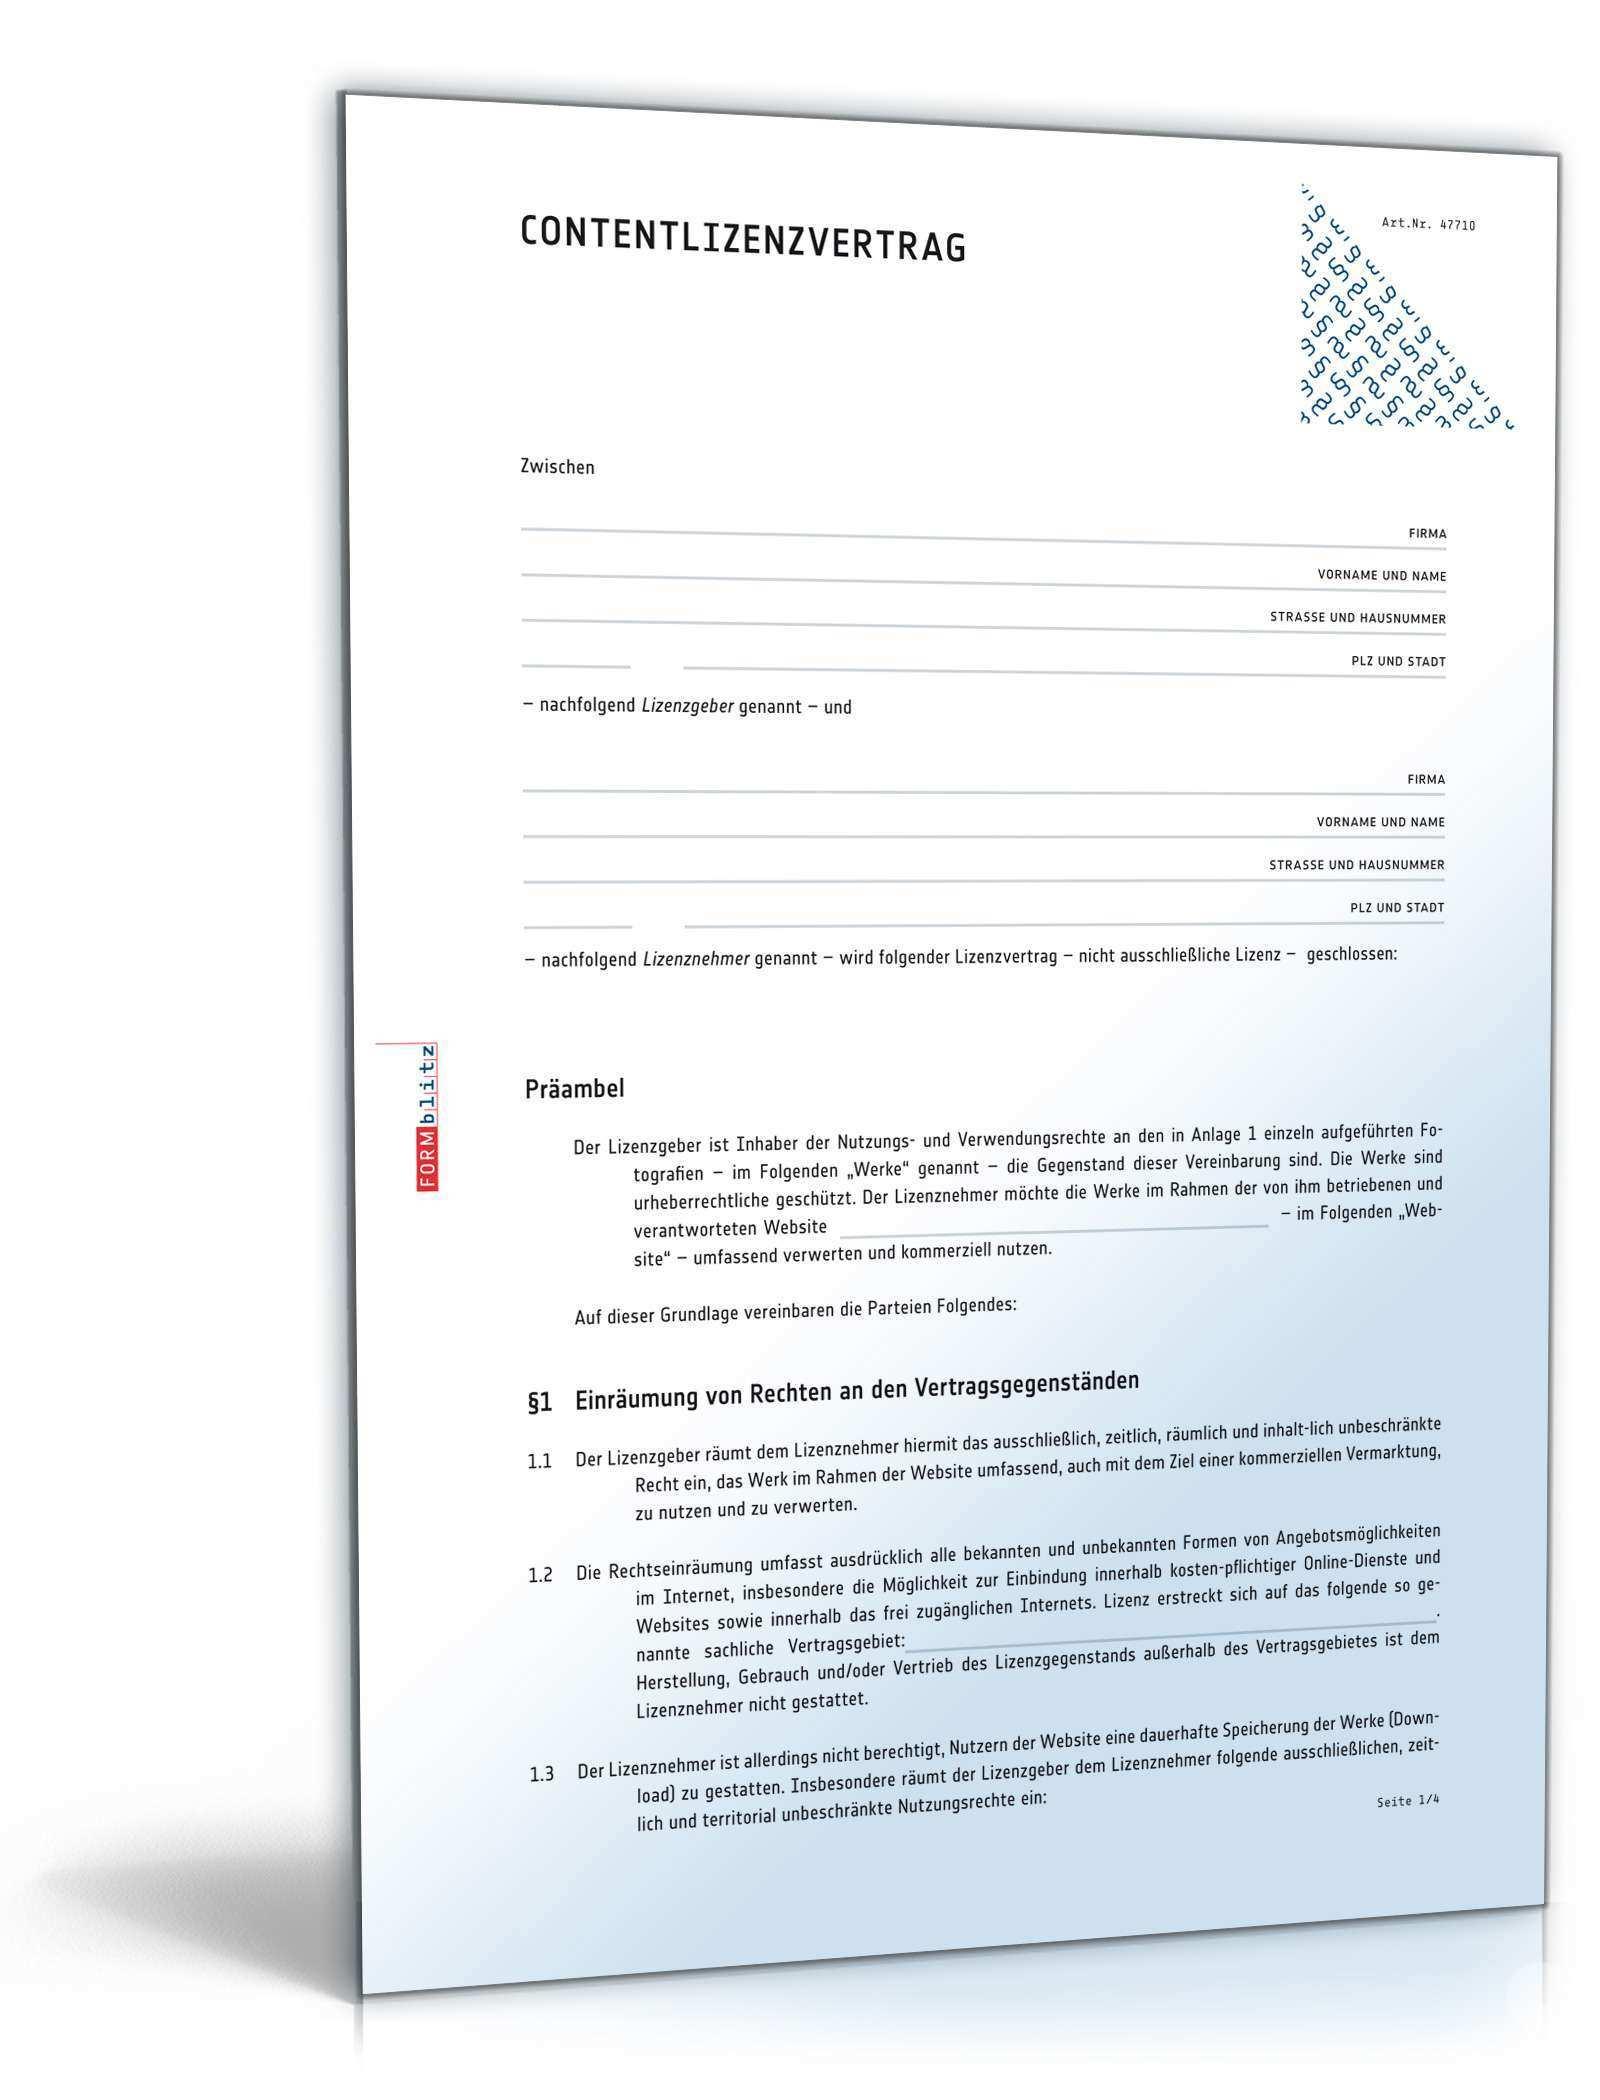 Content Lizenzvertrag Muster Zum Download